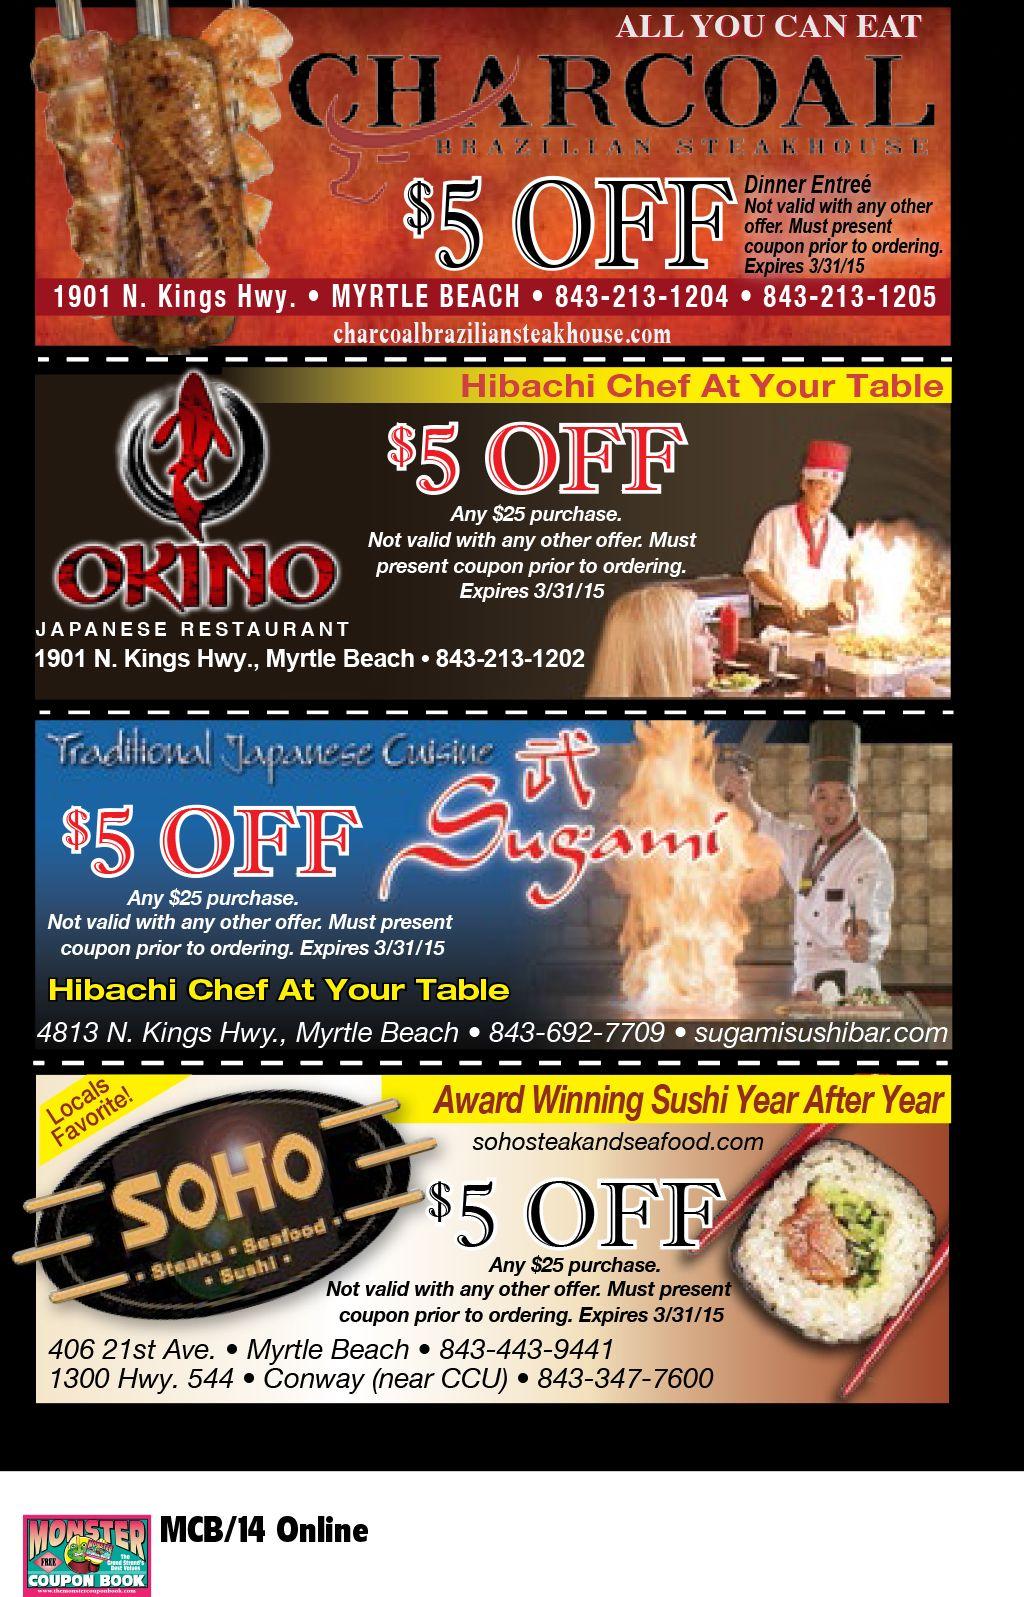 Okino Japanese Restaurant Myrtle Beach Resorts Steak And Seafood Myrtle Beach Restaurants Myrtle Beach Resorts